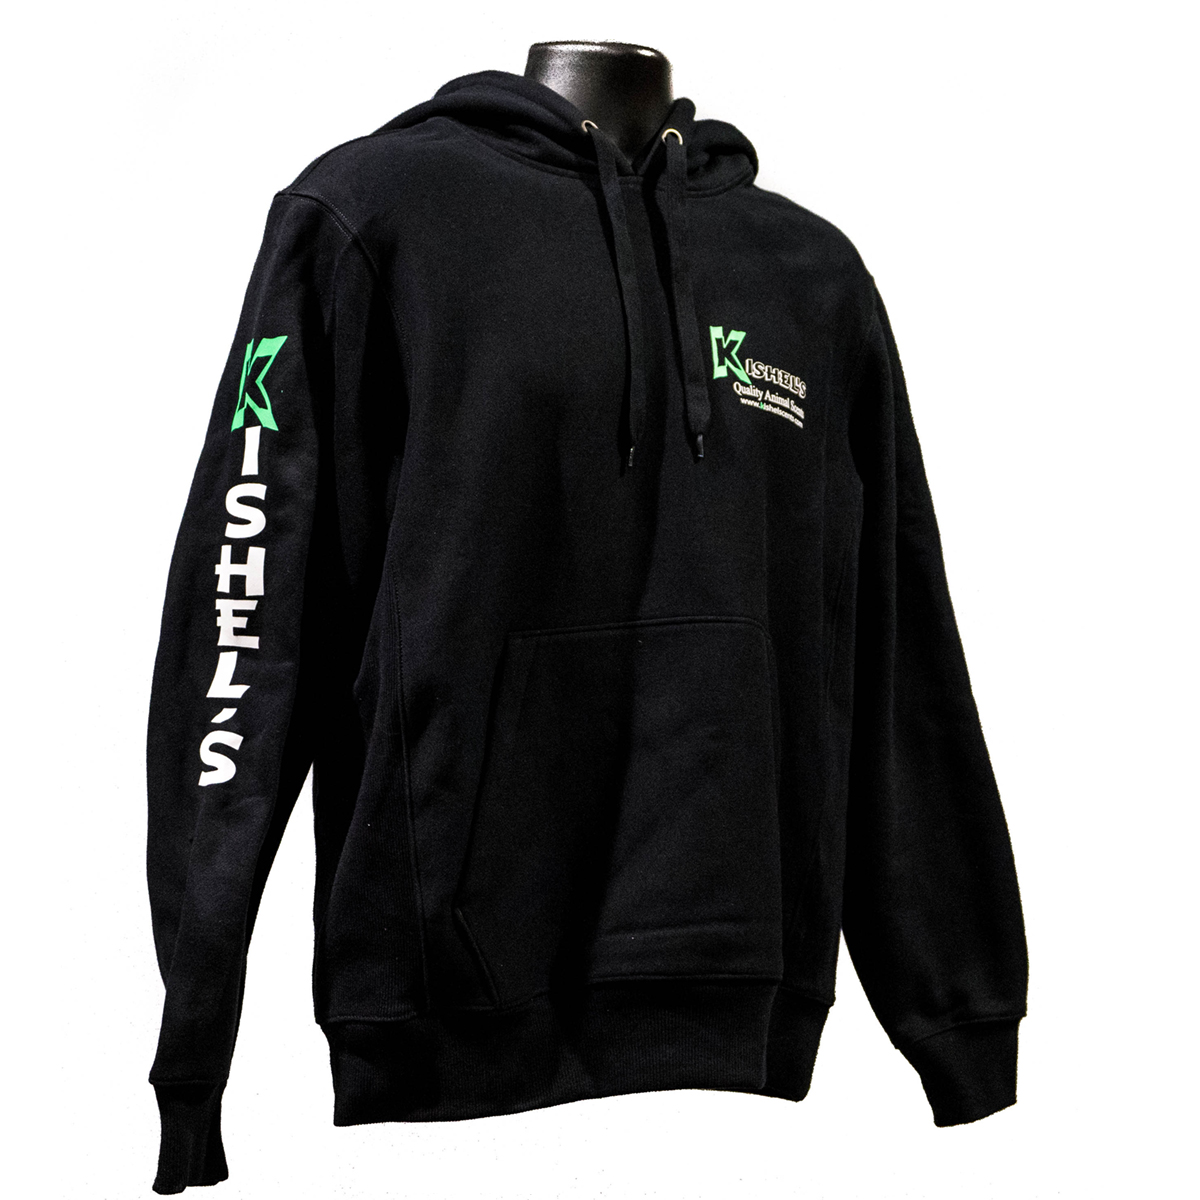 kishels scents black hooded sweatshirt